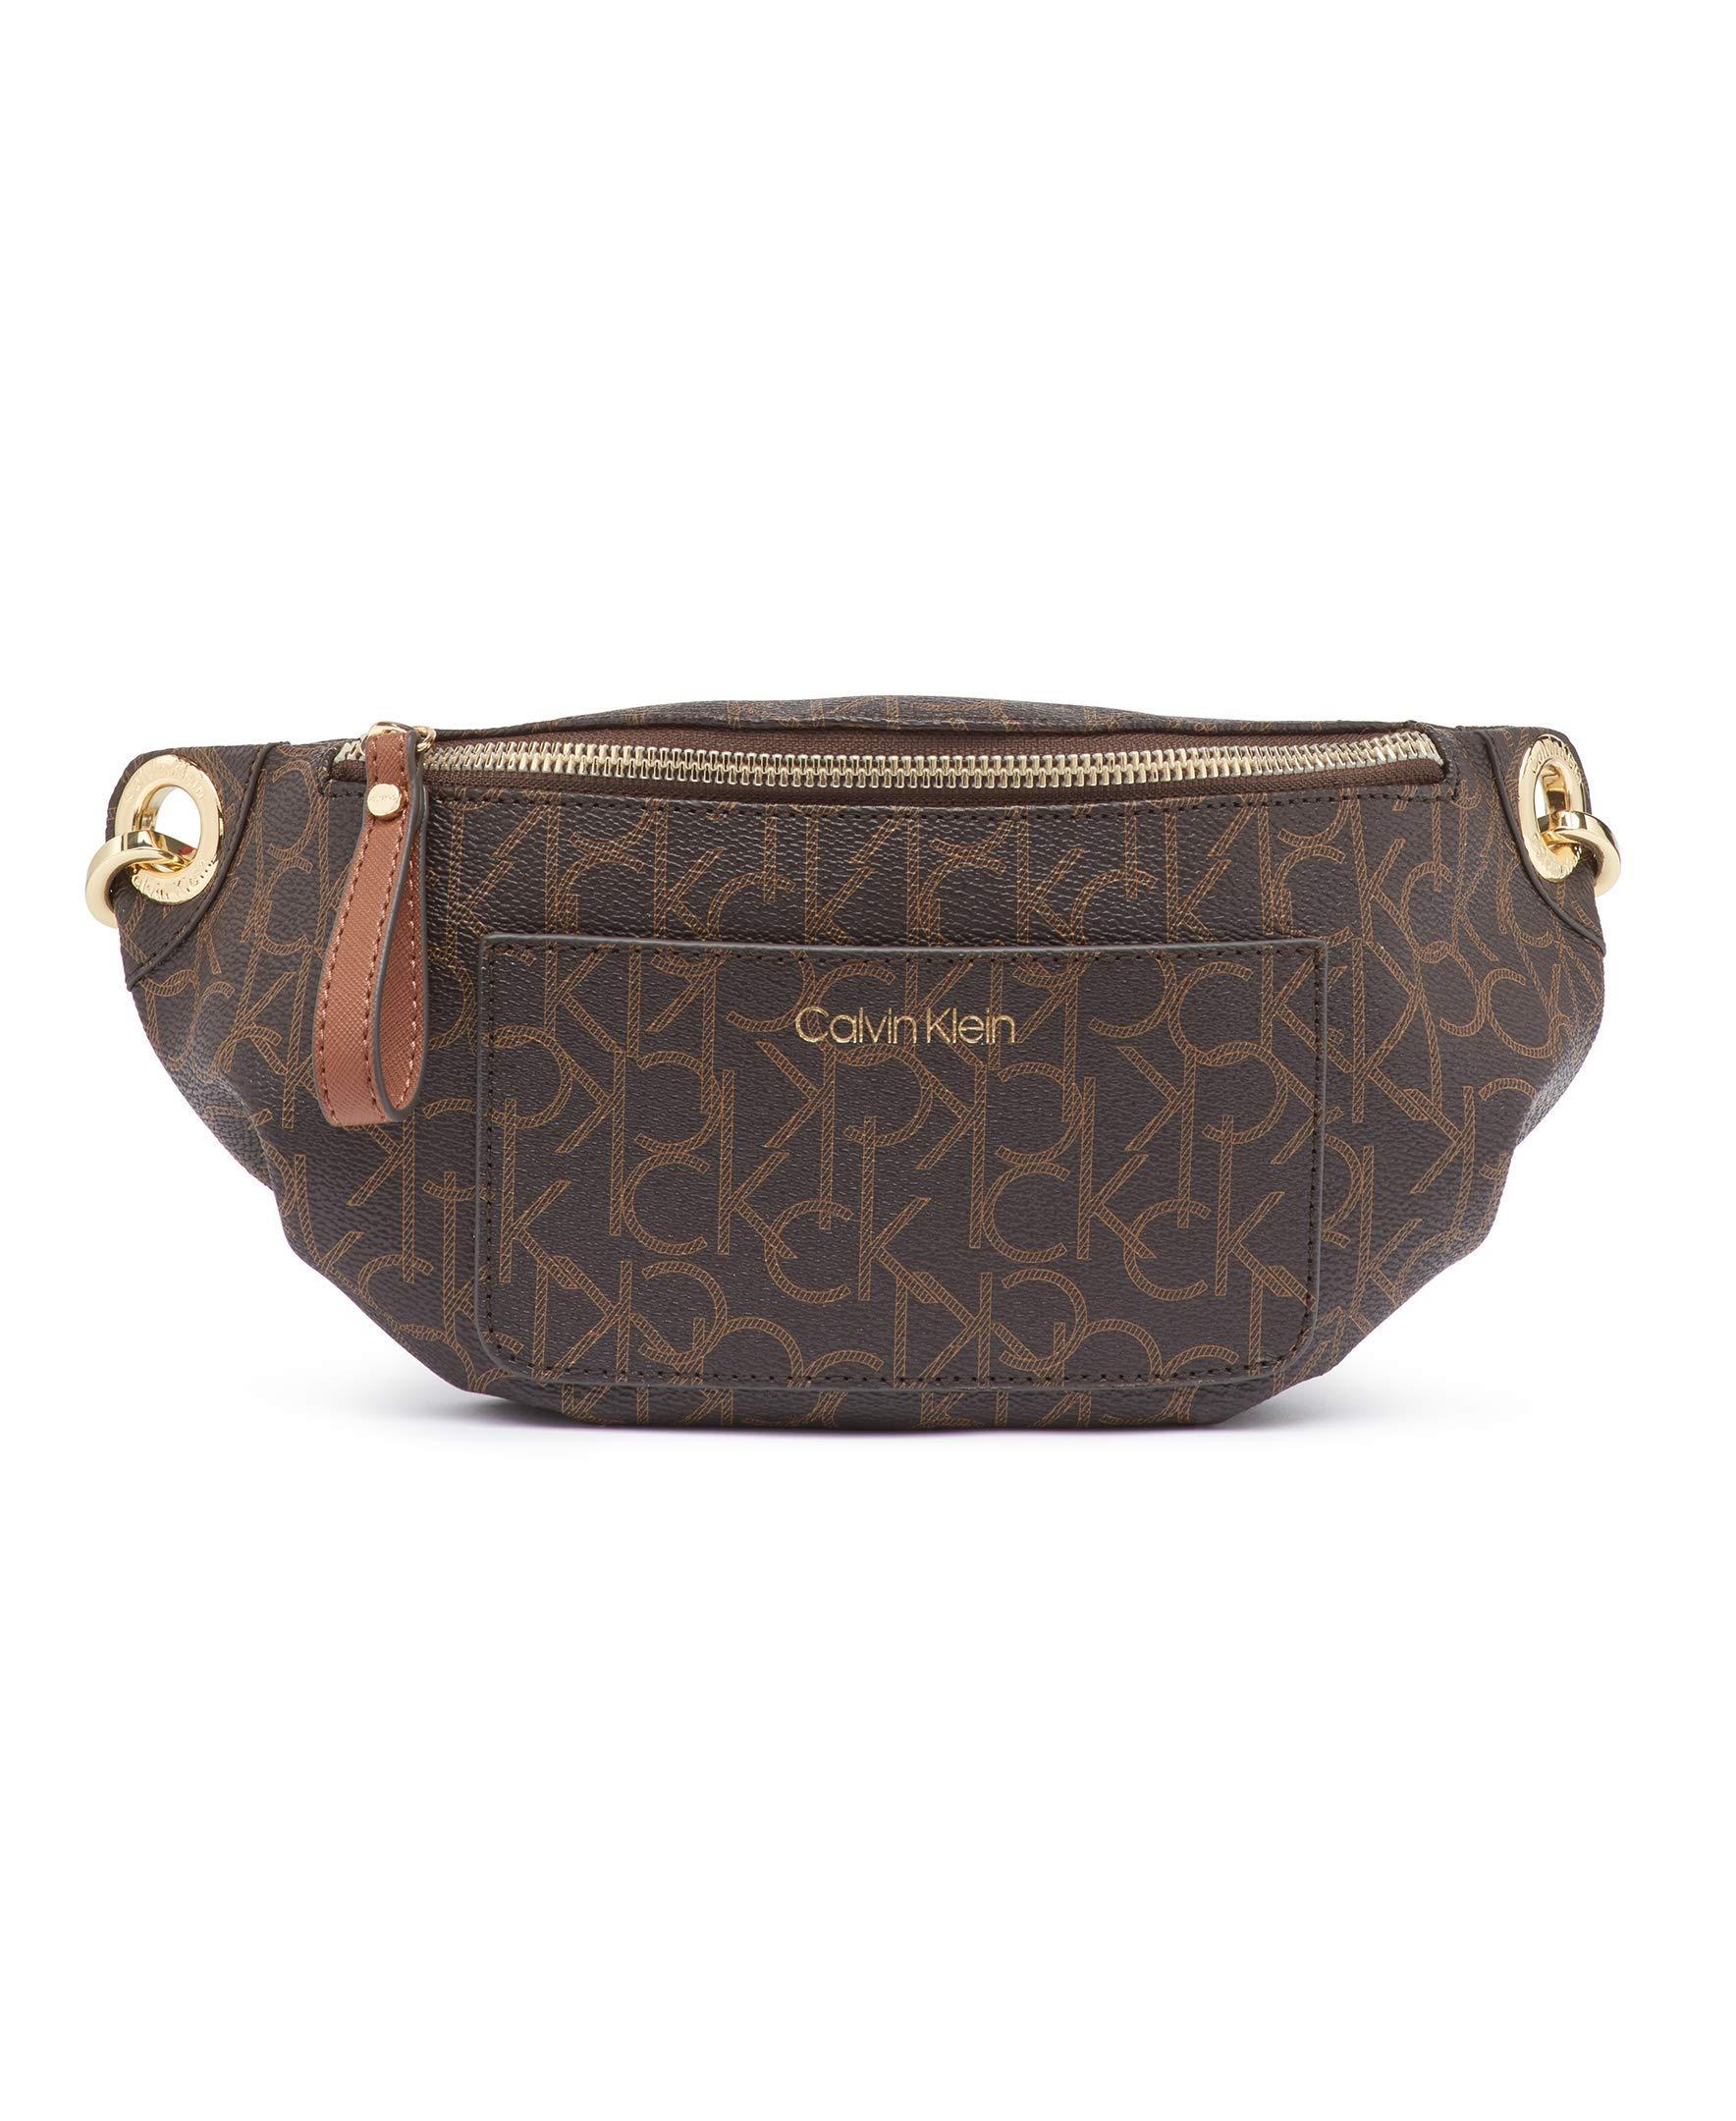 Calvin Klein Sonoma Signature Monogram Belt Bag, brown/khaki/luggage saffiano